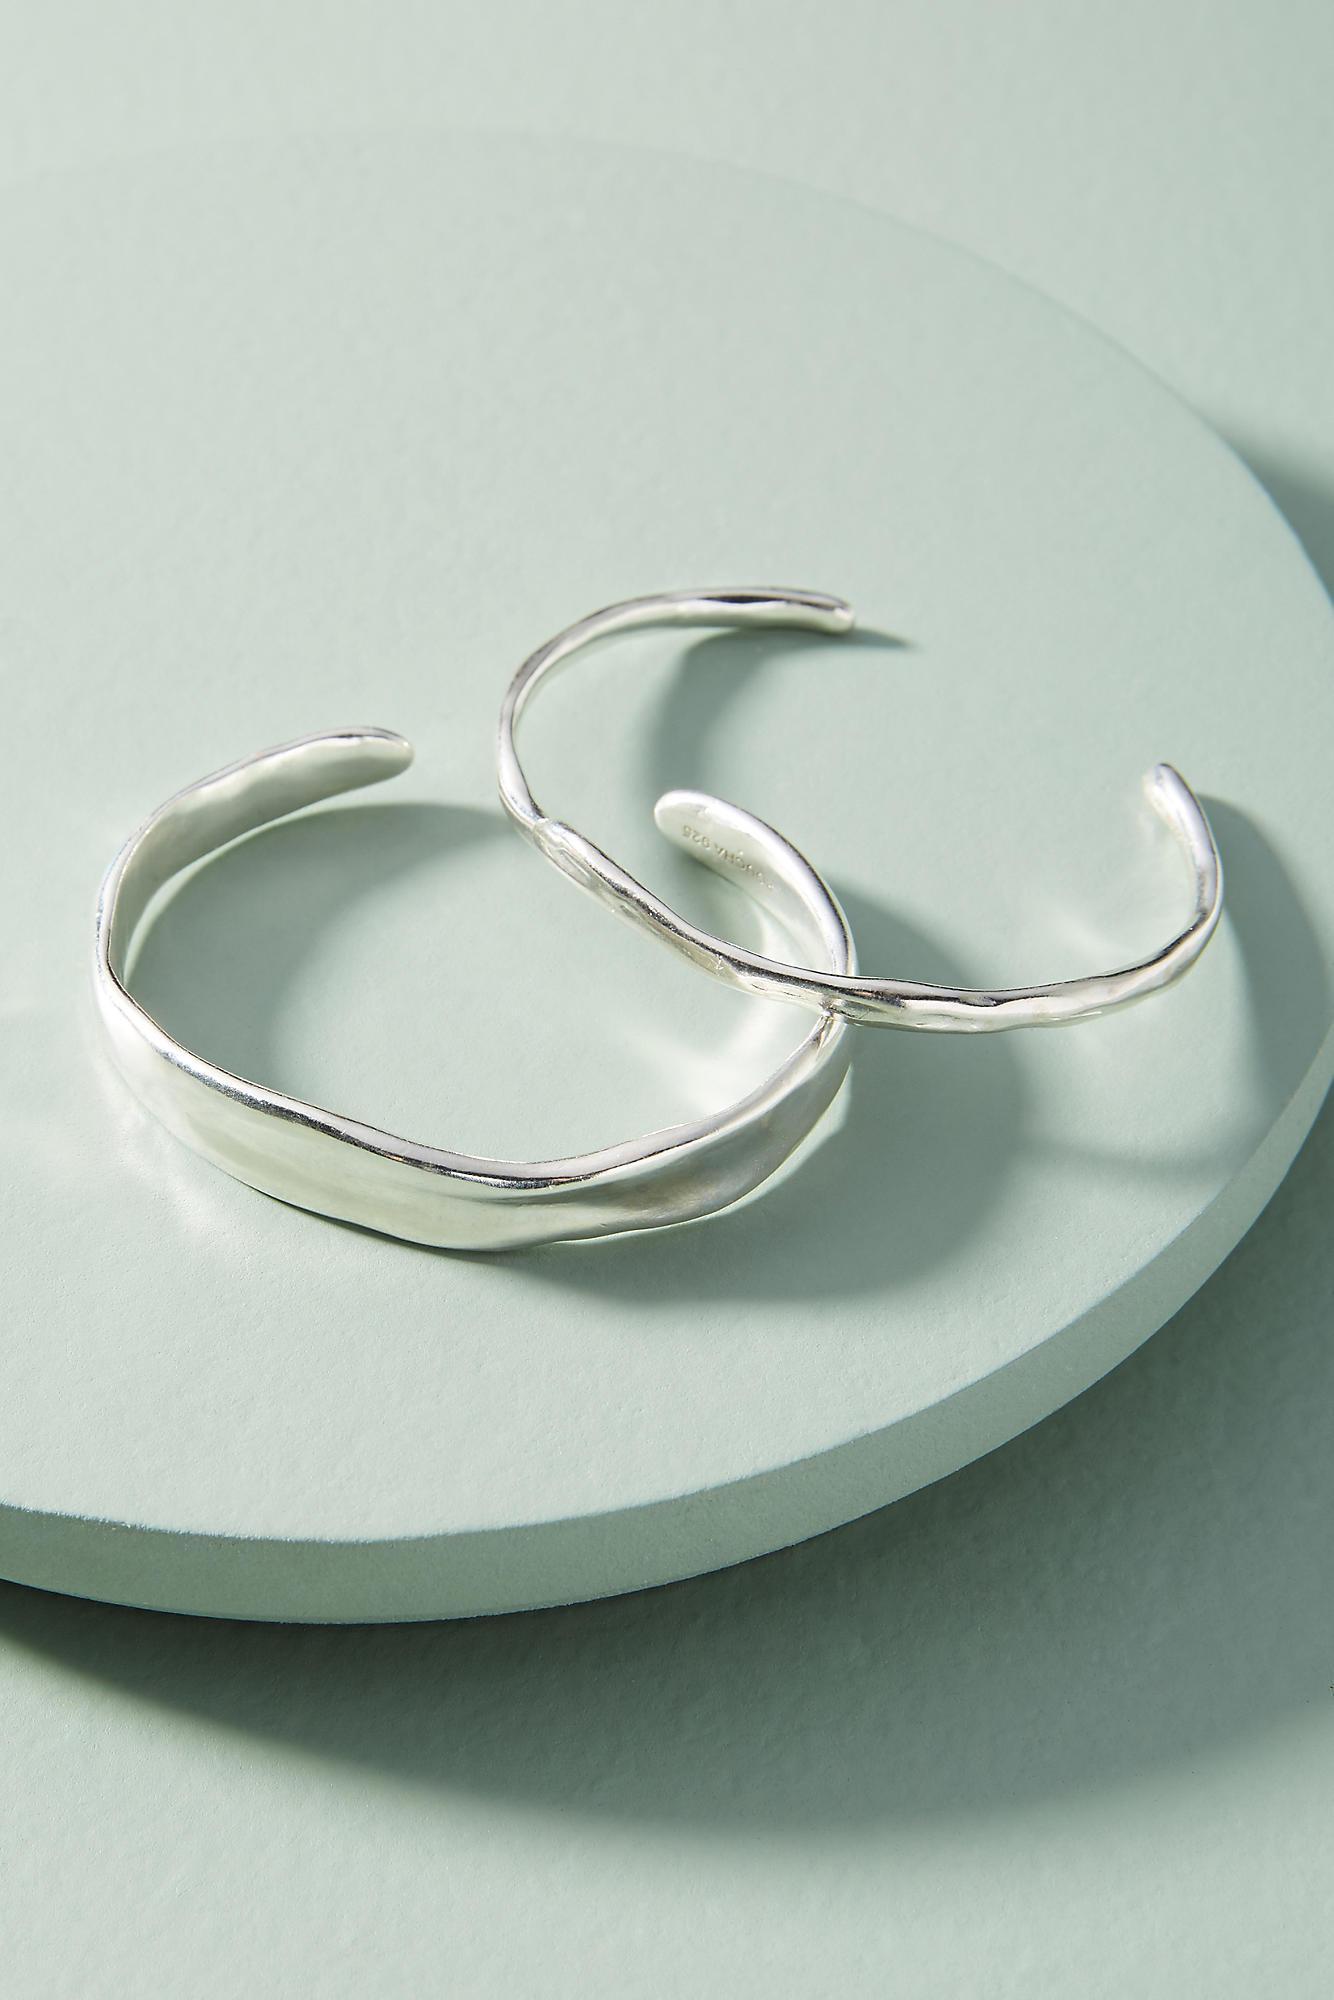 Anthropologie Modern Metalwork Cuff Bracelet Set qfgC6Cs1